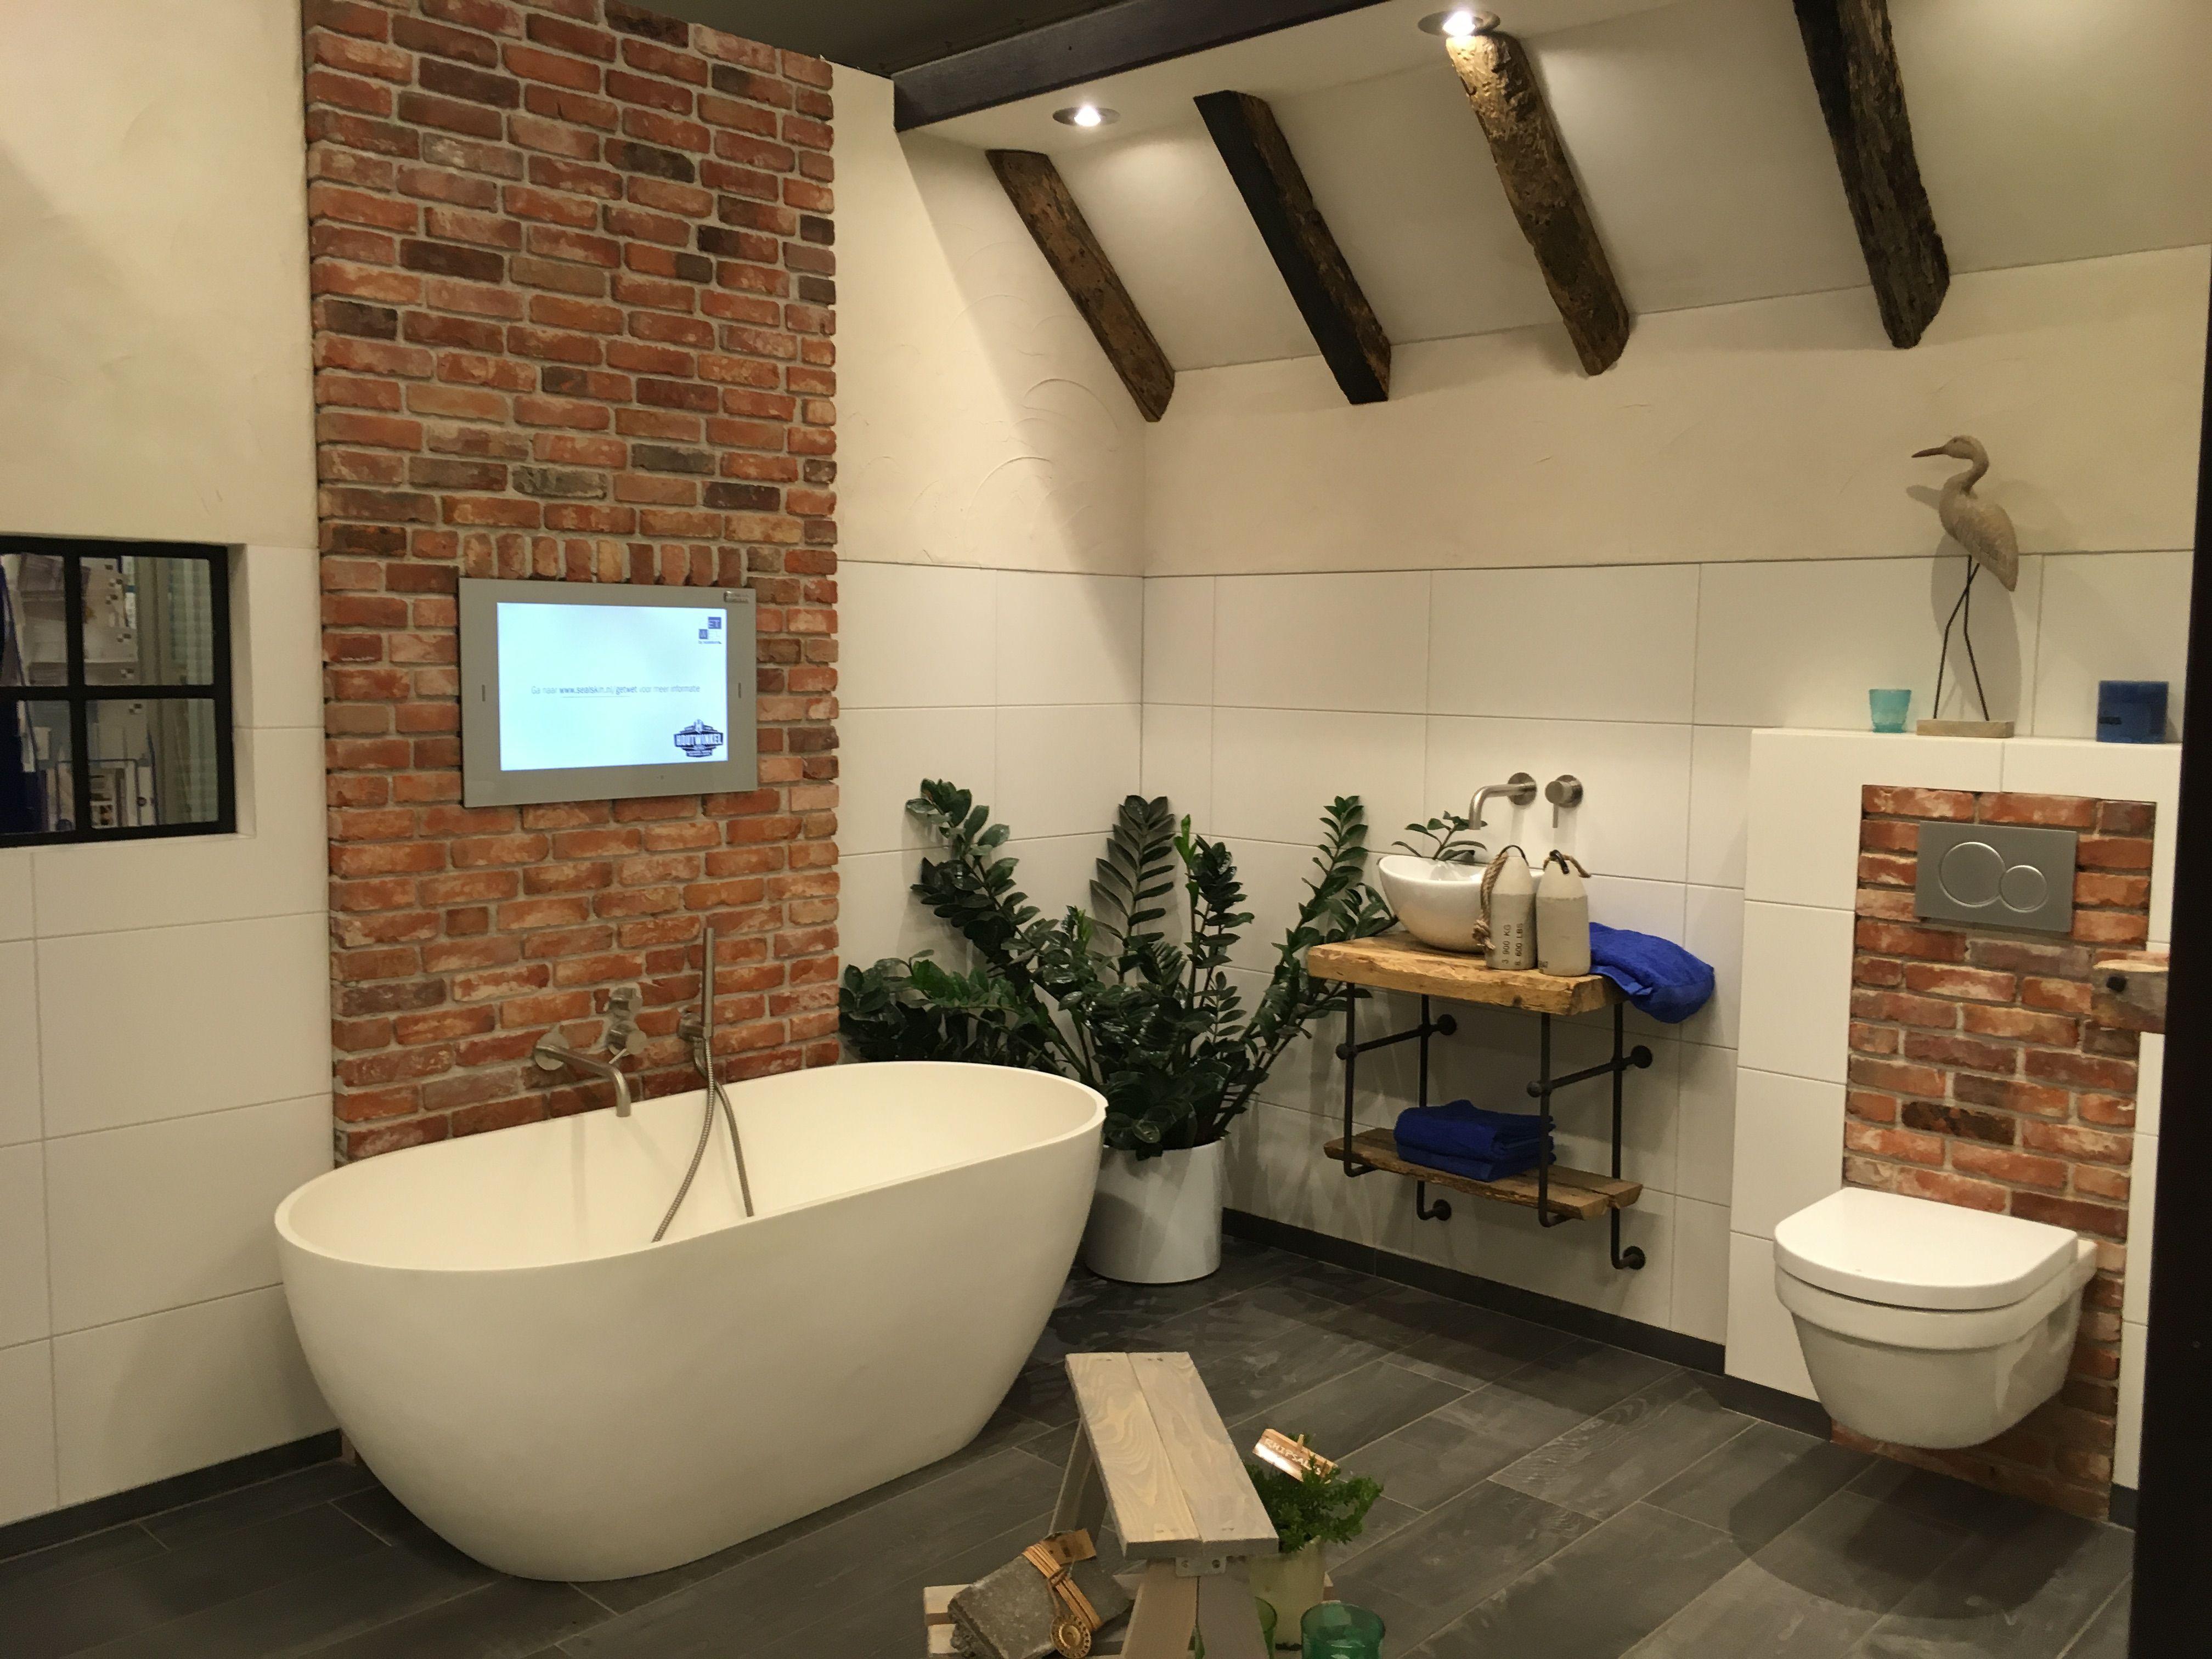 Wandtegels Badkamer Hubo : Badkamer showroom hubo houtwinkel bladel badkamer toilet